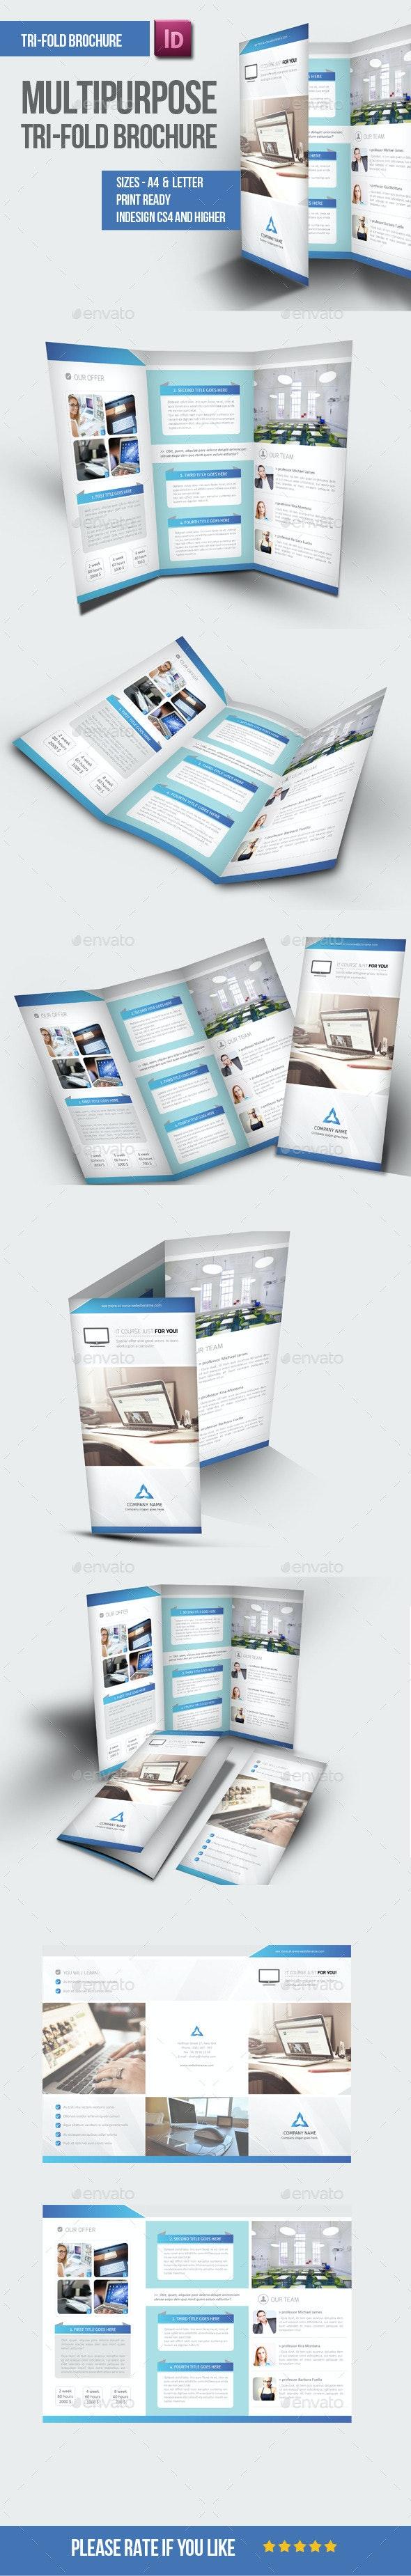 Multipurpose Tri-fold Brochure - Brochures Print Templates